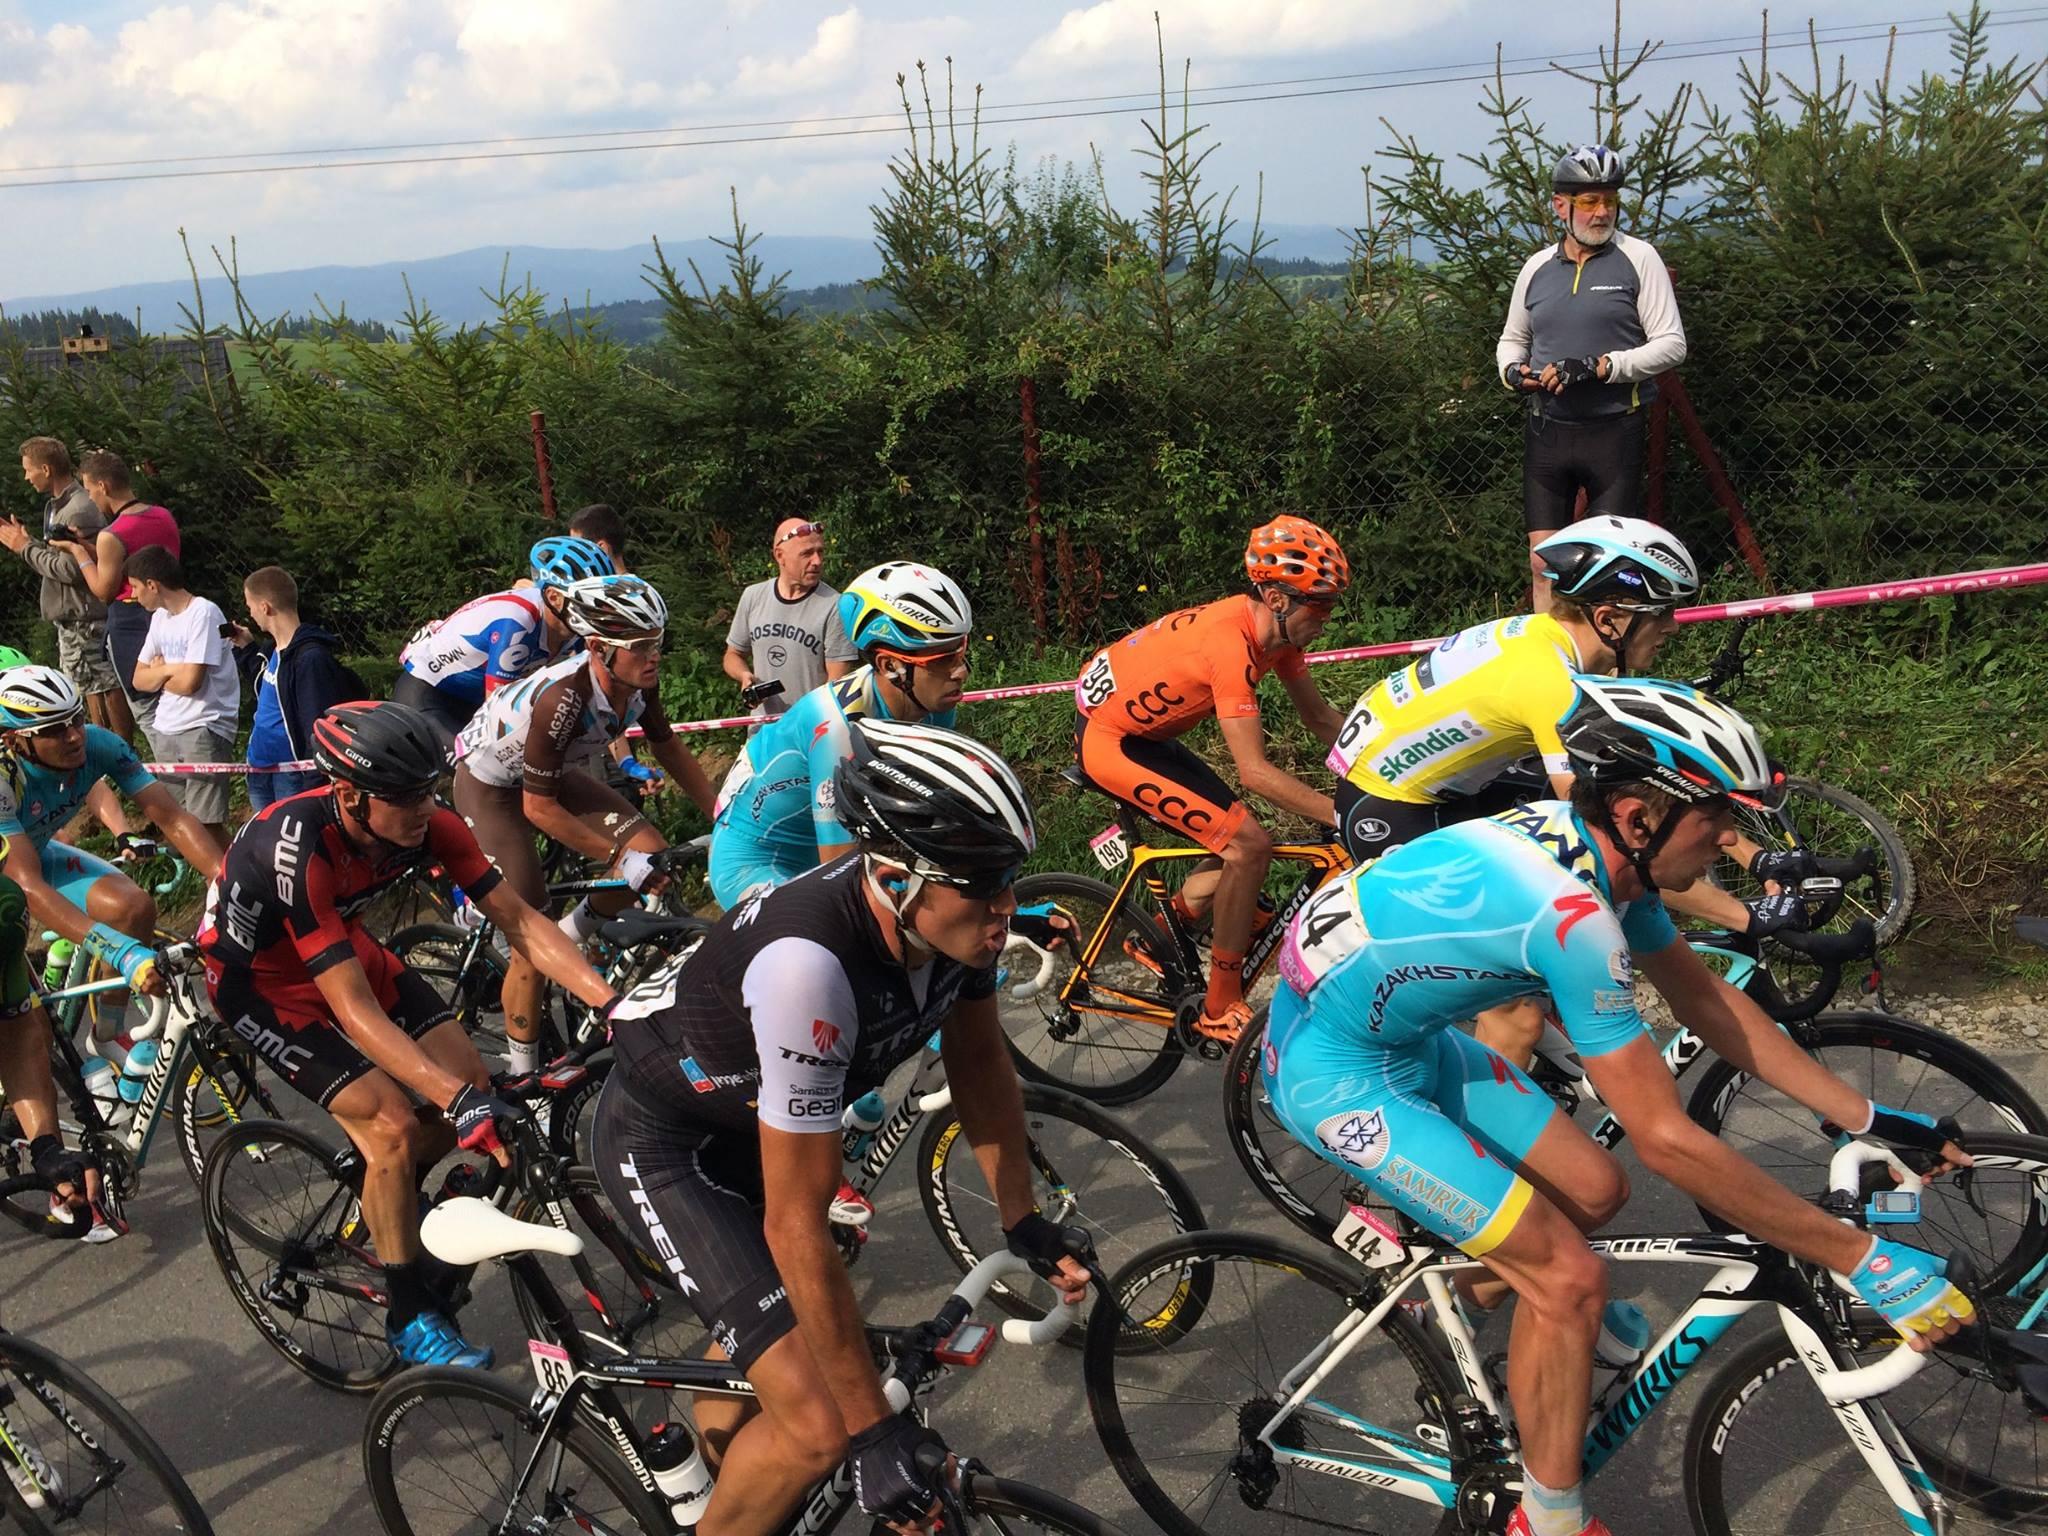 Tour-de-Pologne-2014-Bukowina (9)